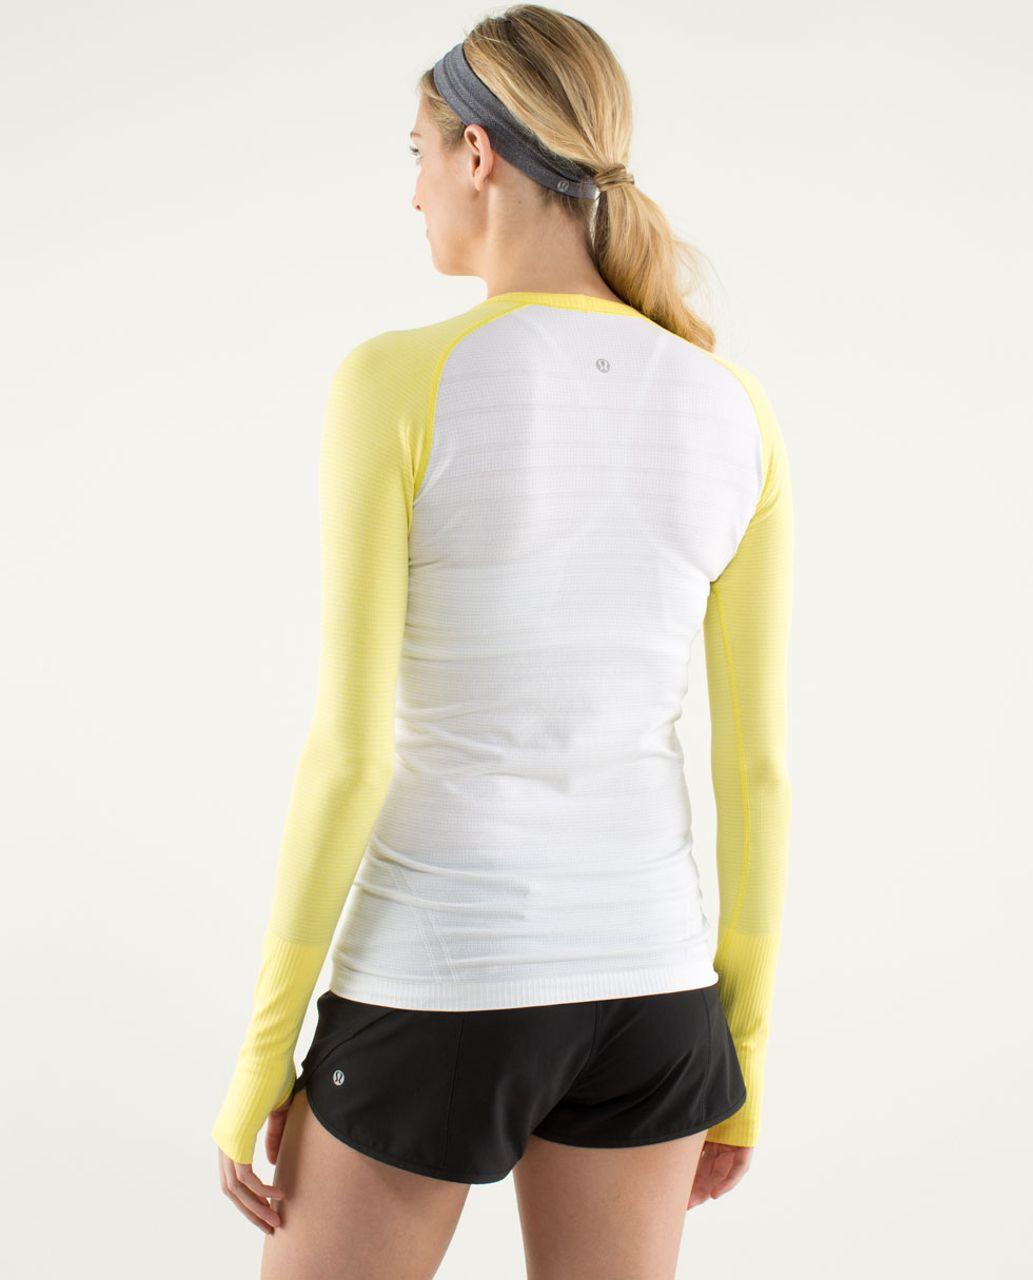 Lululemon Run:  Swiftly Tech Long Sleeve - White / Sizzle